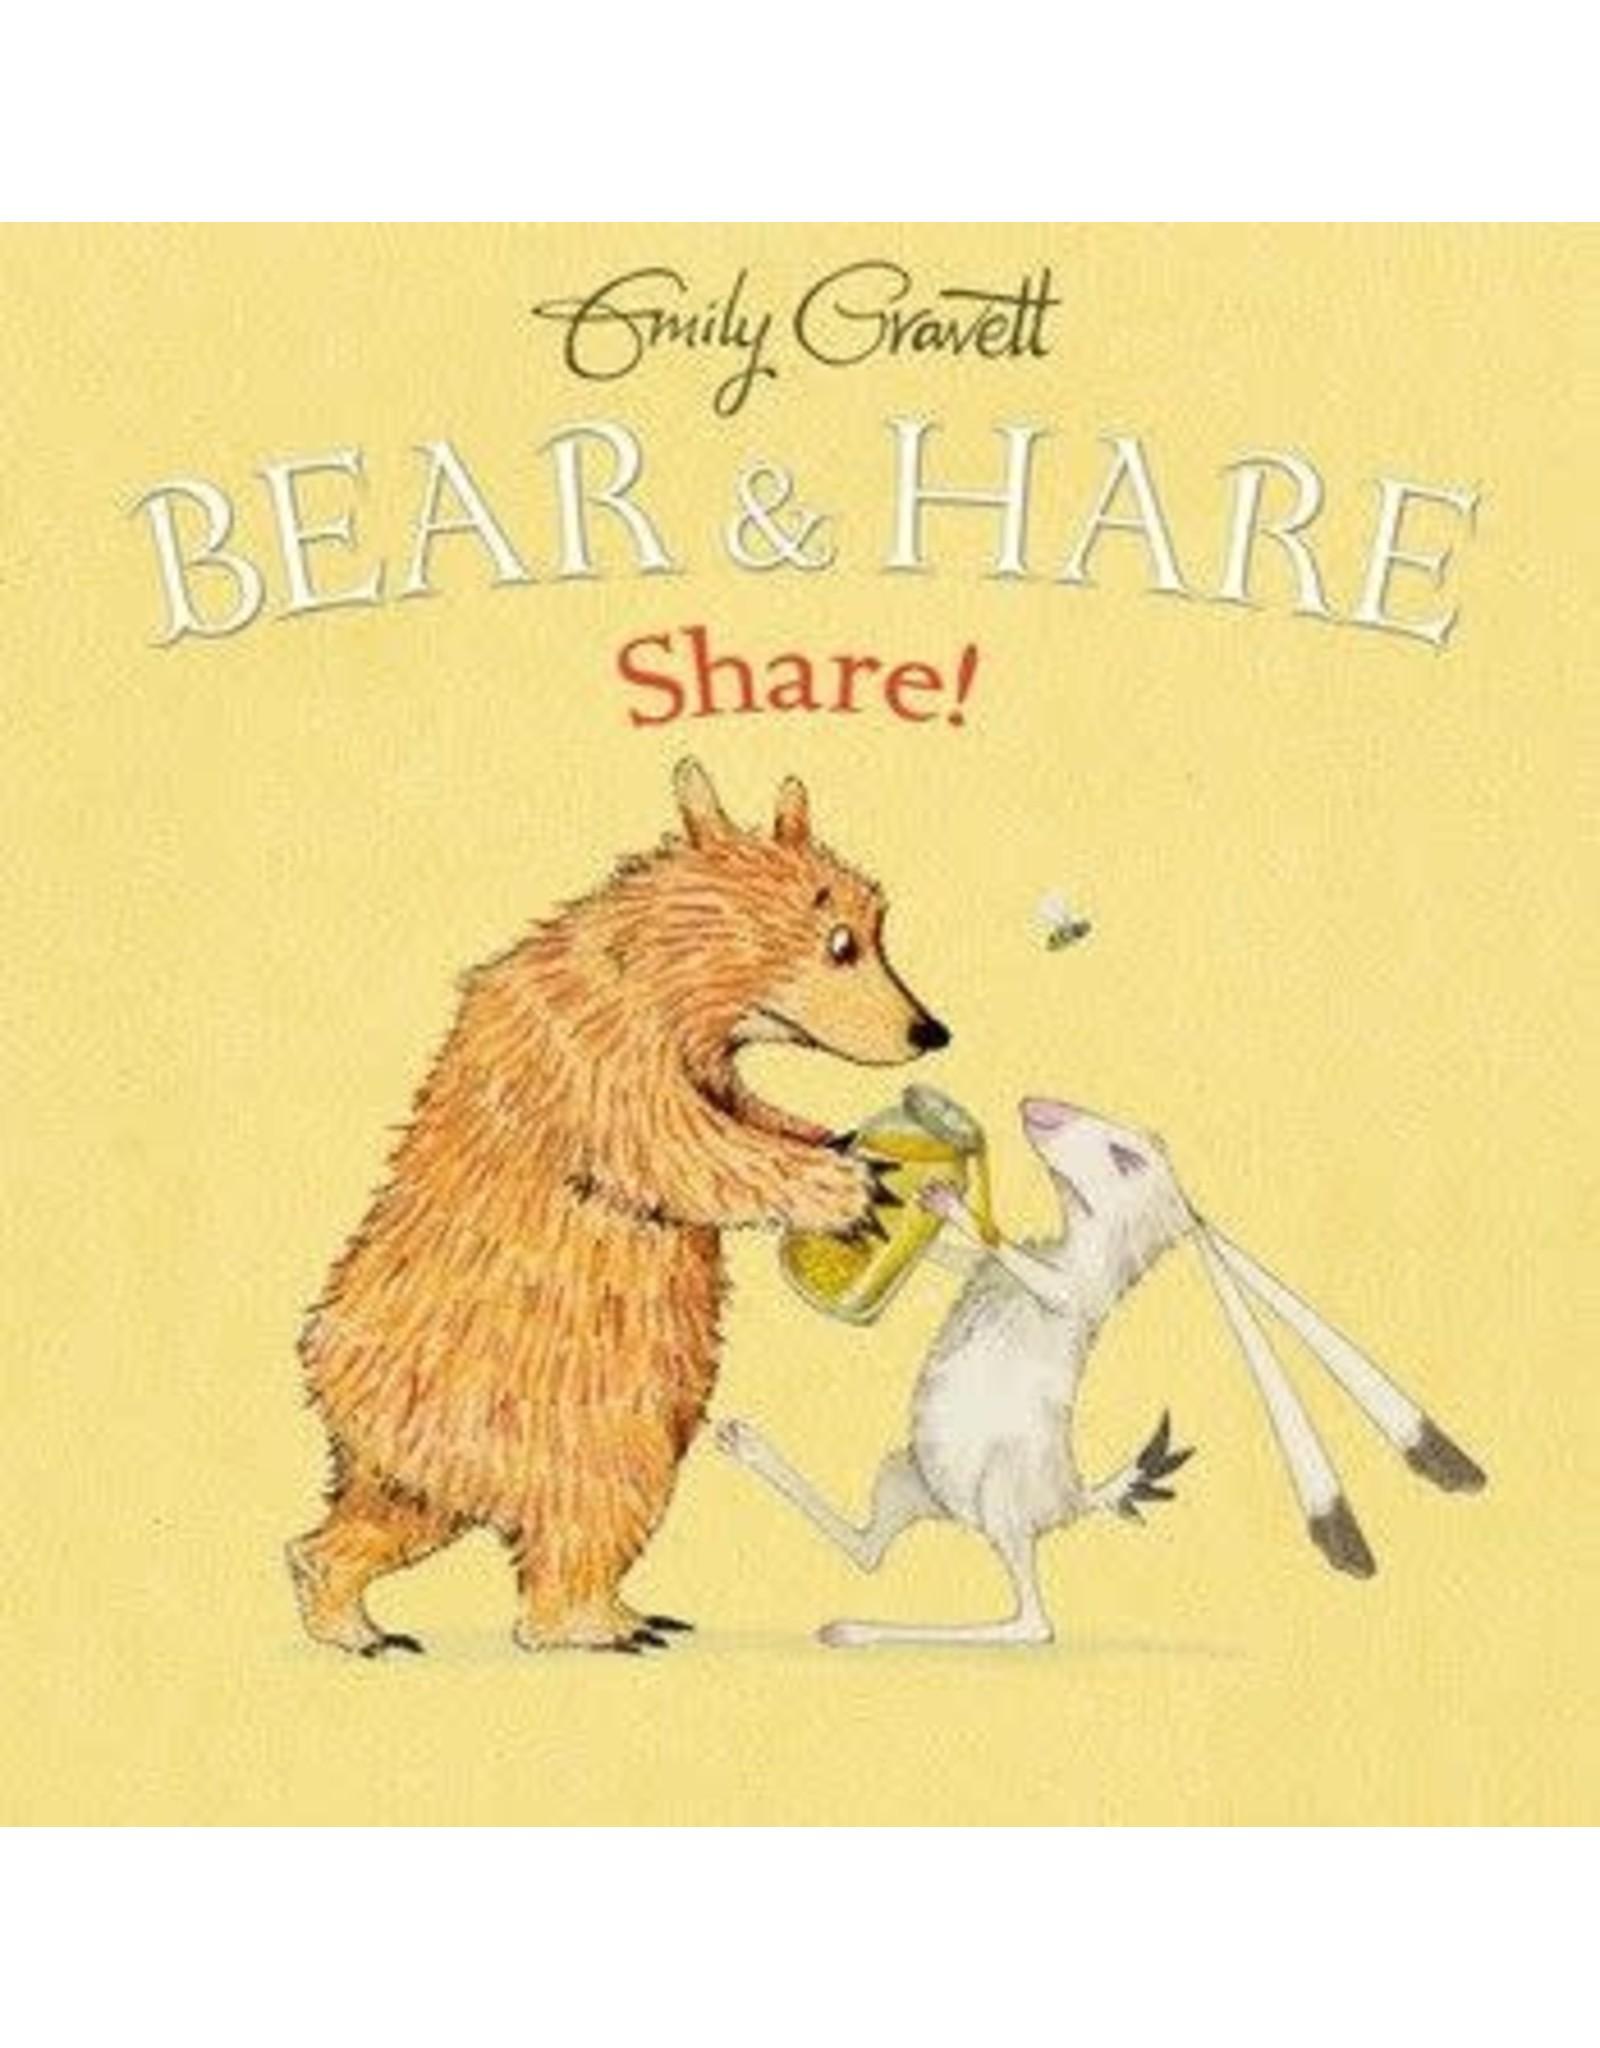 Bear & Hair Share!